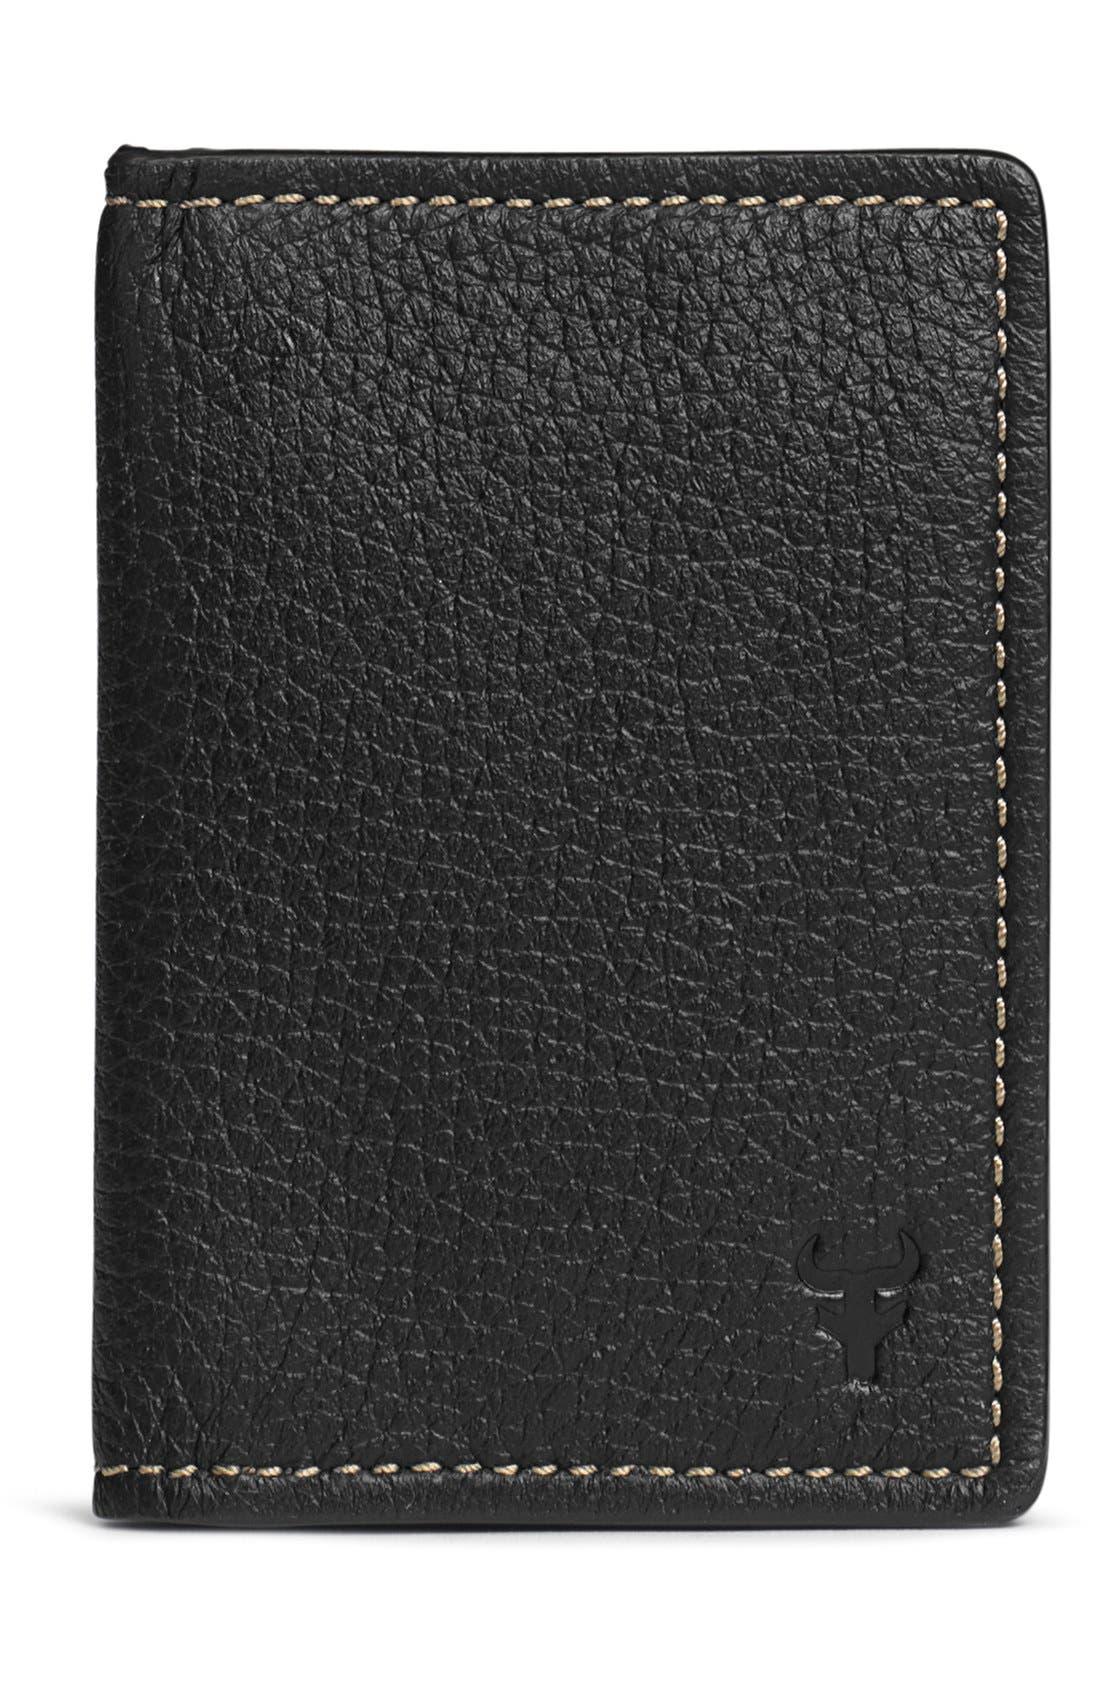 TRASK Jackson Folding Card Case